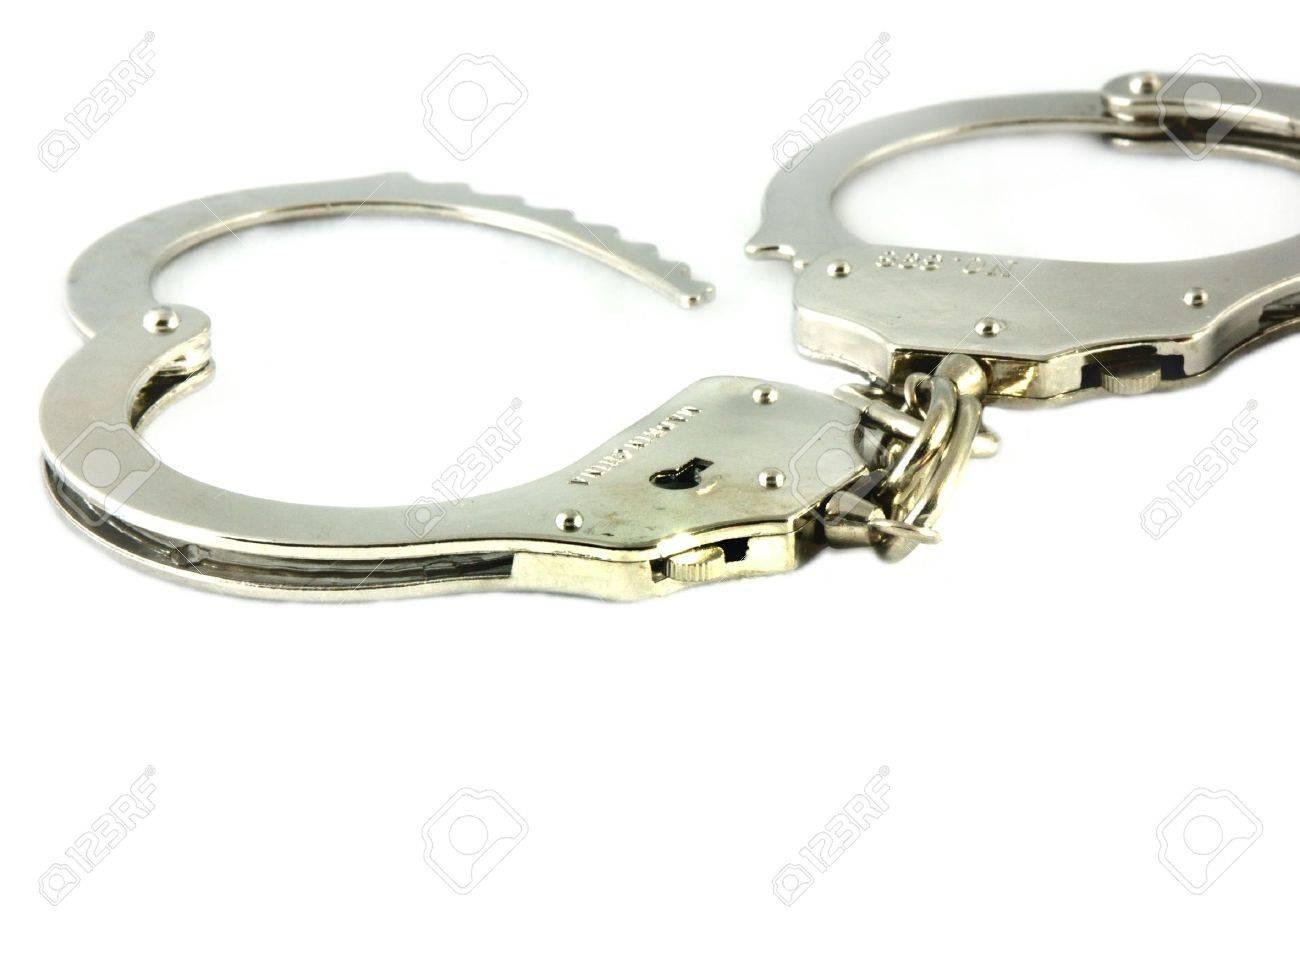 isolated highkey handcuffs Stock Photo - 286172